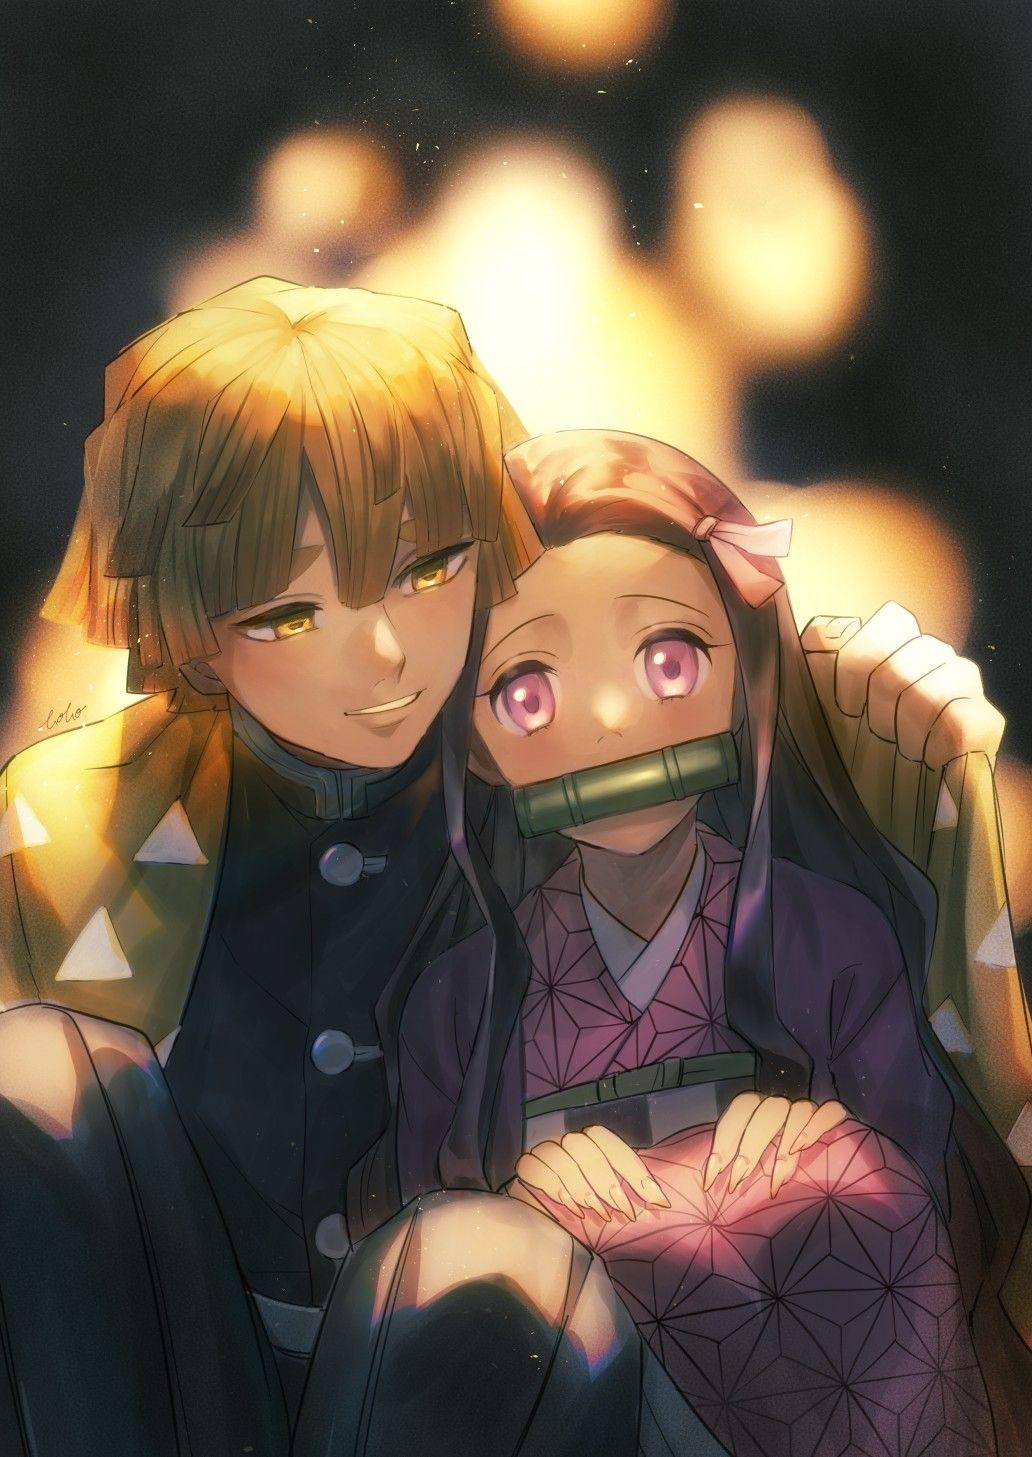 Zenitsu X Nezuko Anime Demon Slayer Anime Anime Romance